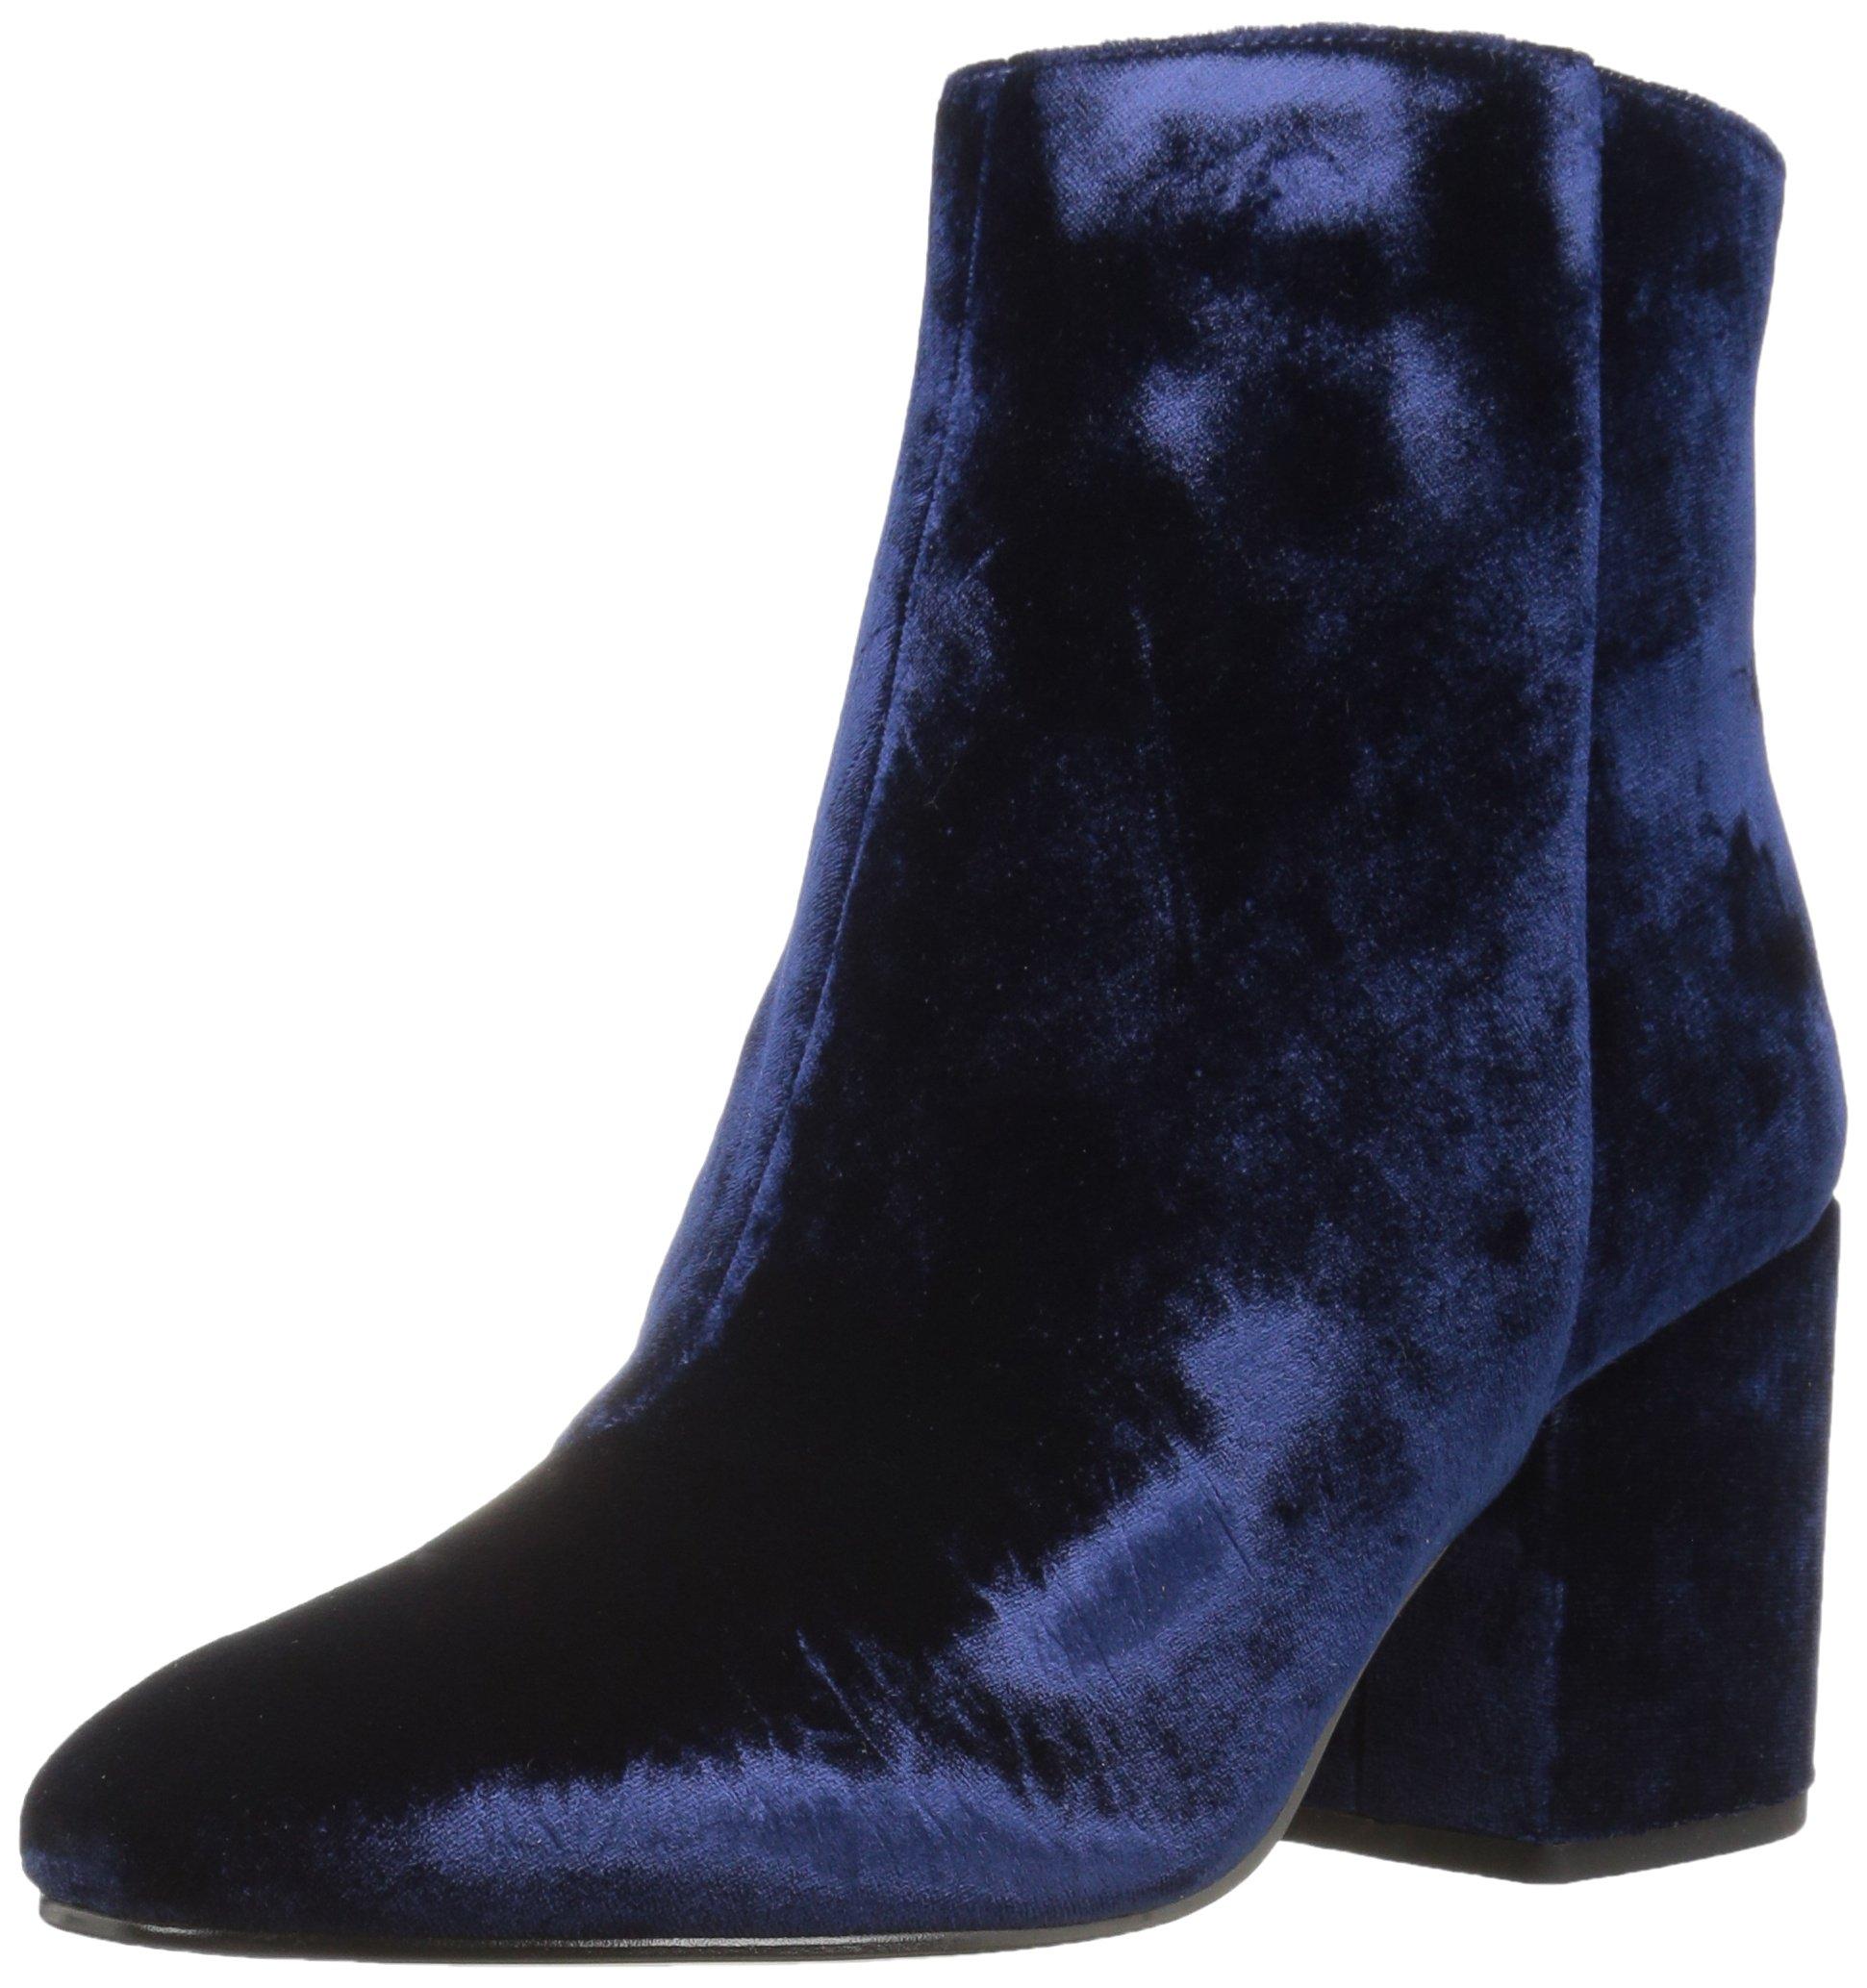 629bad6759c51 Galleon - Sam Edelman Women s Taye Ankle Boot